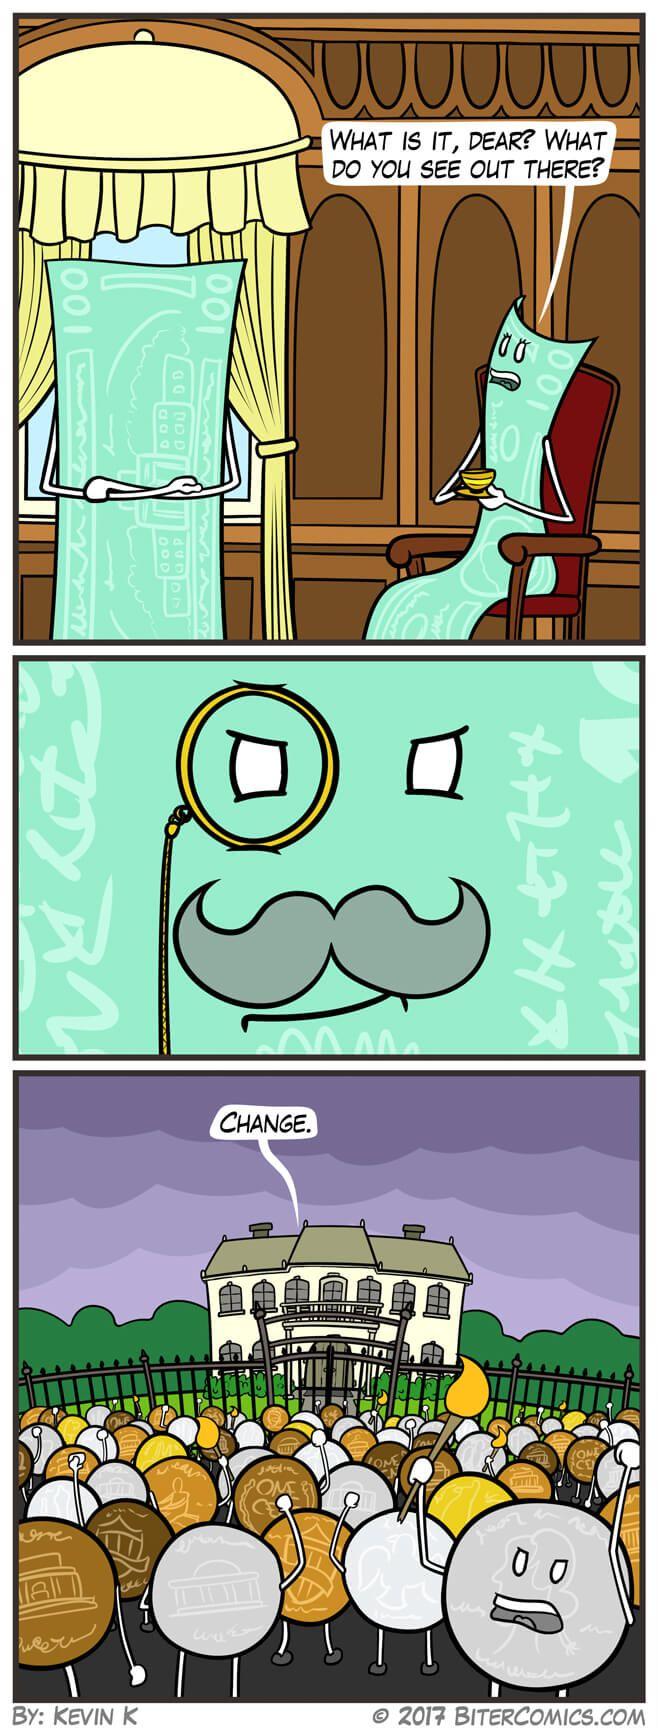 Bilderparade CDLXI Funny cartoon memes, Funny jokes